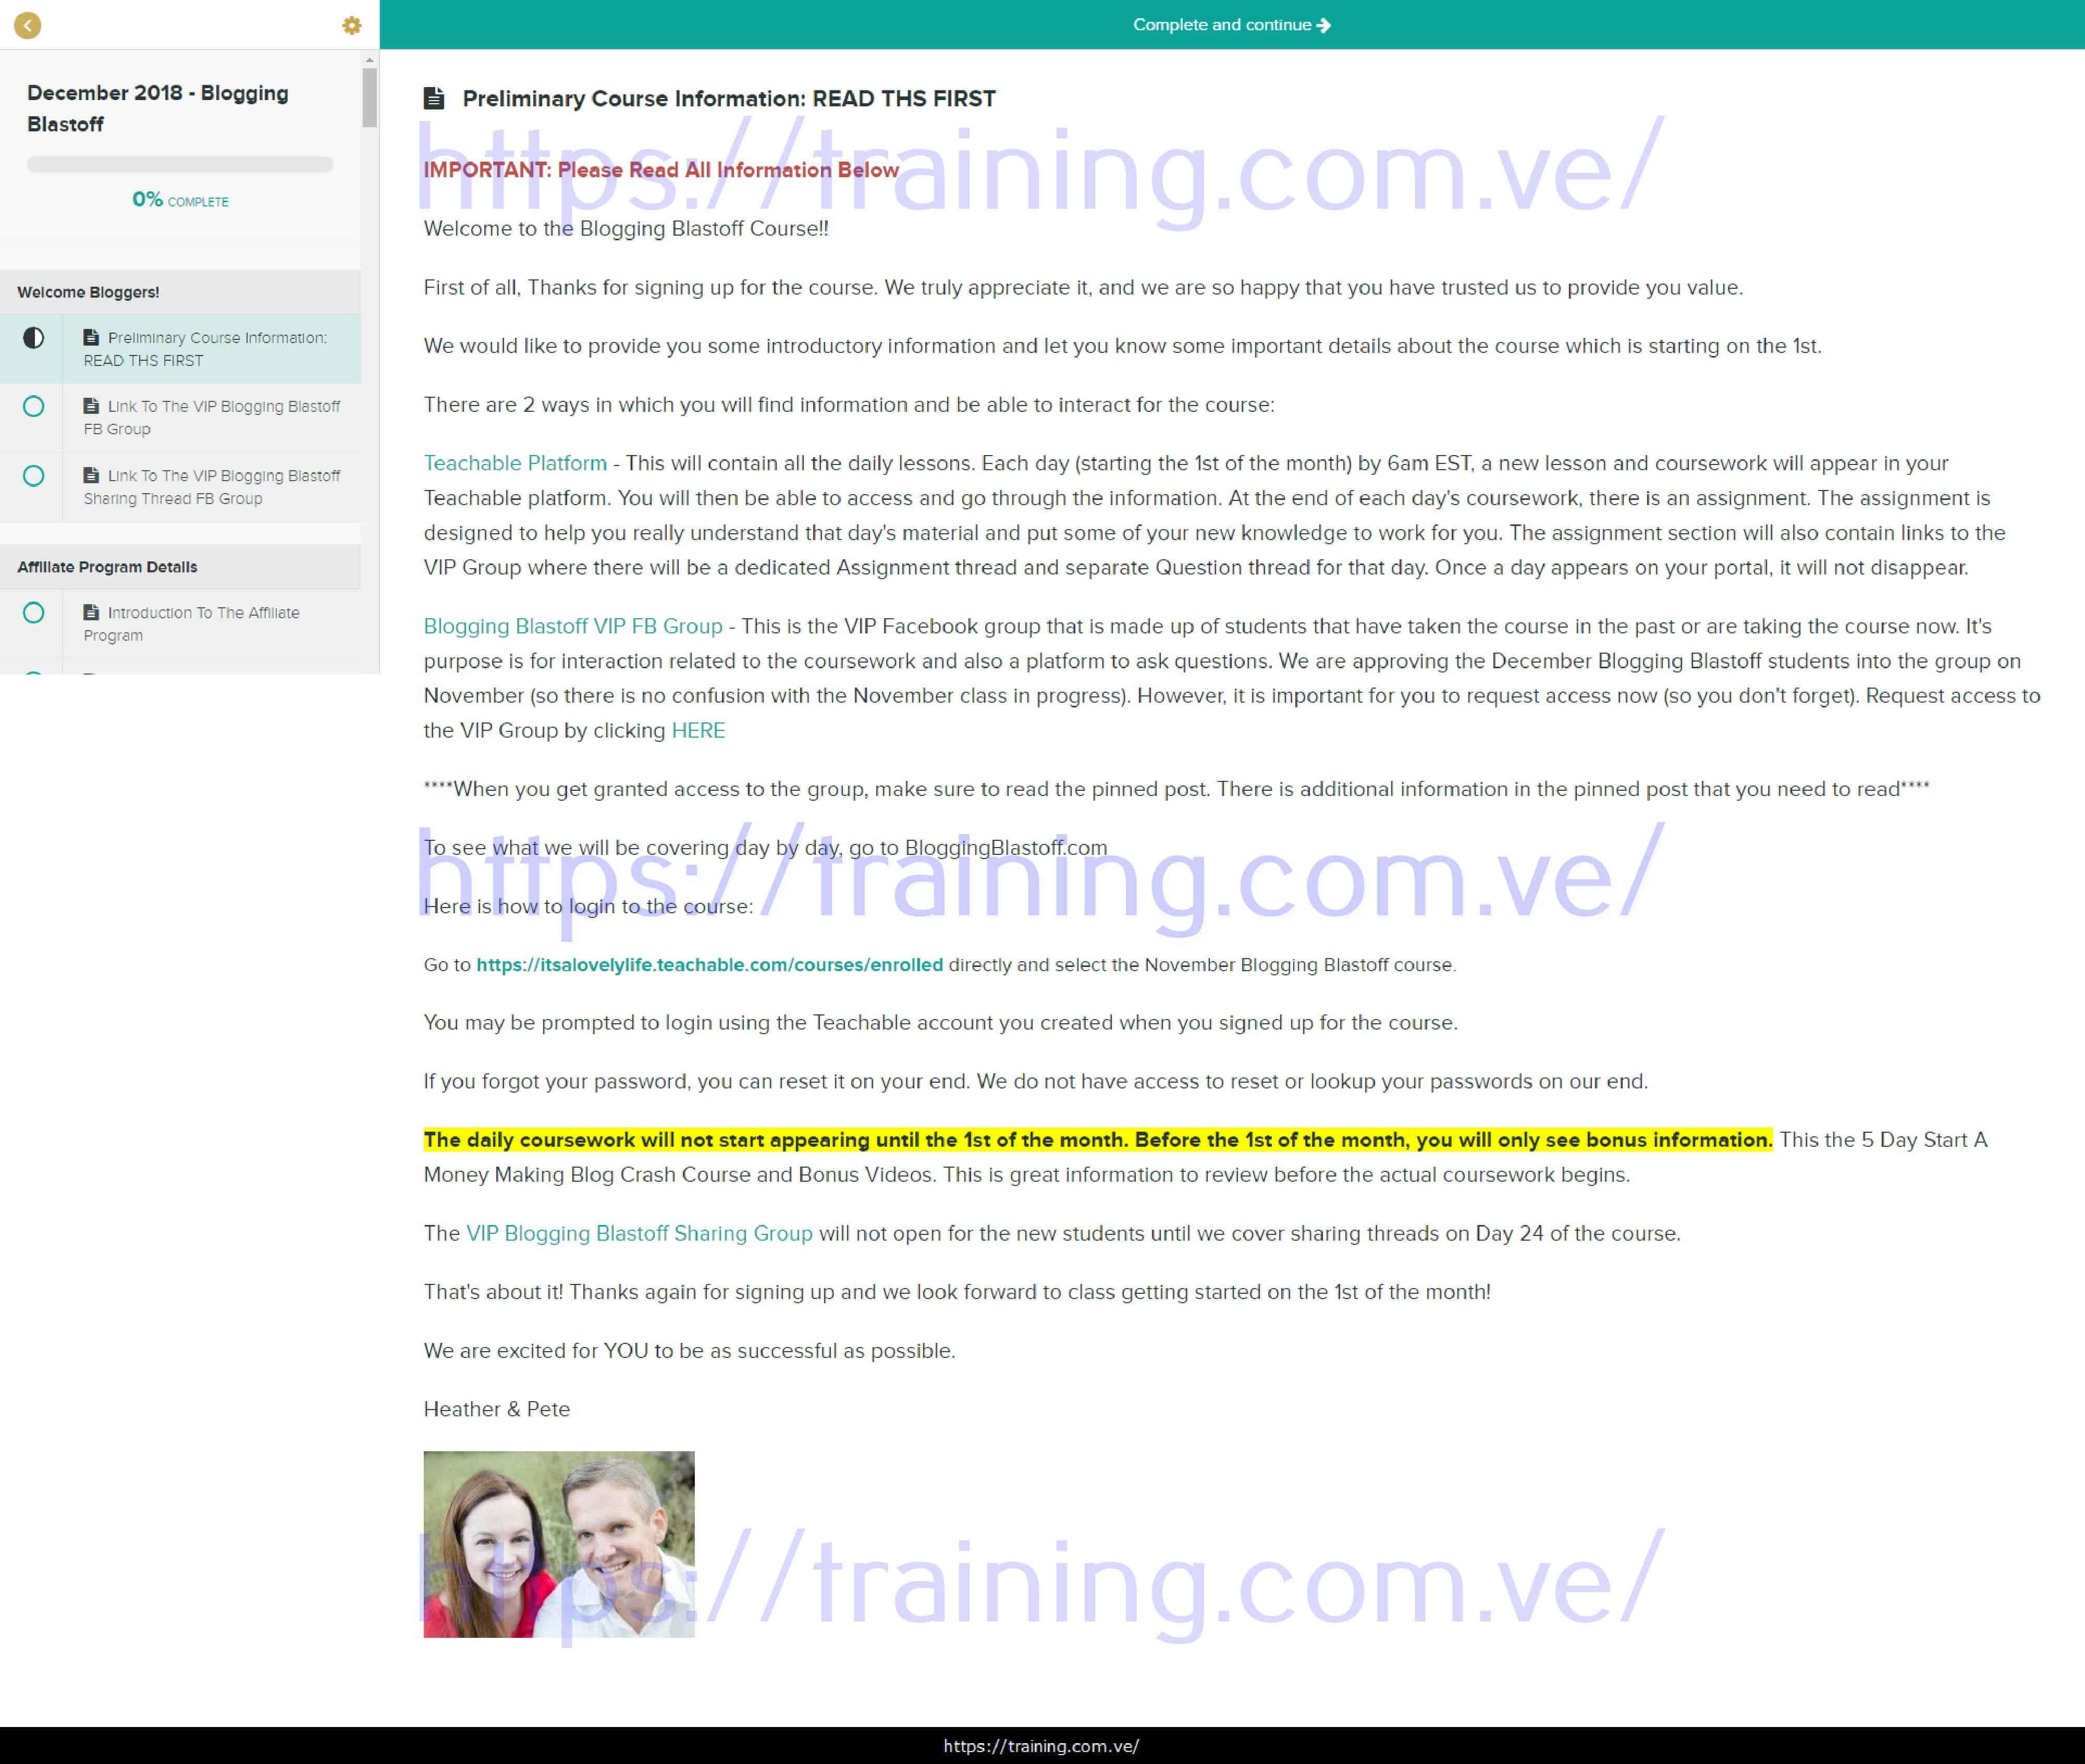 Blogging Blastoff by Heather Delaney Reese Download